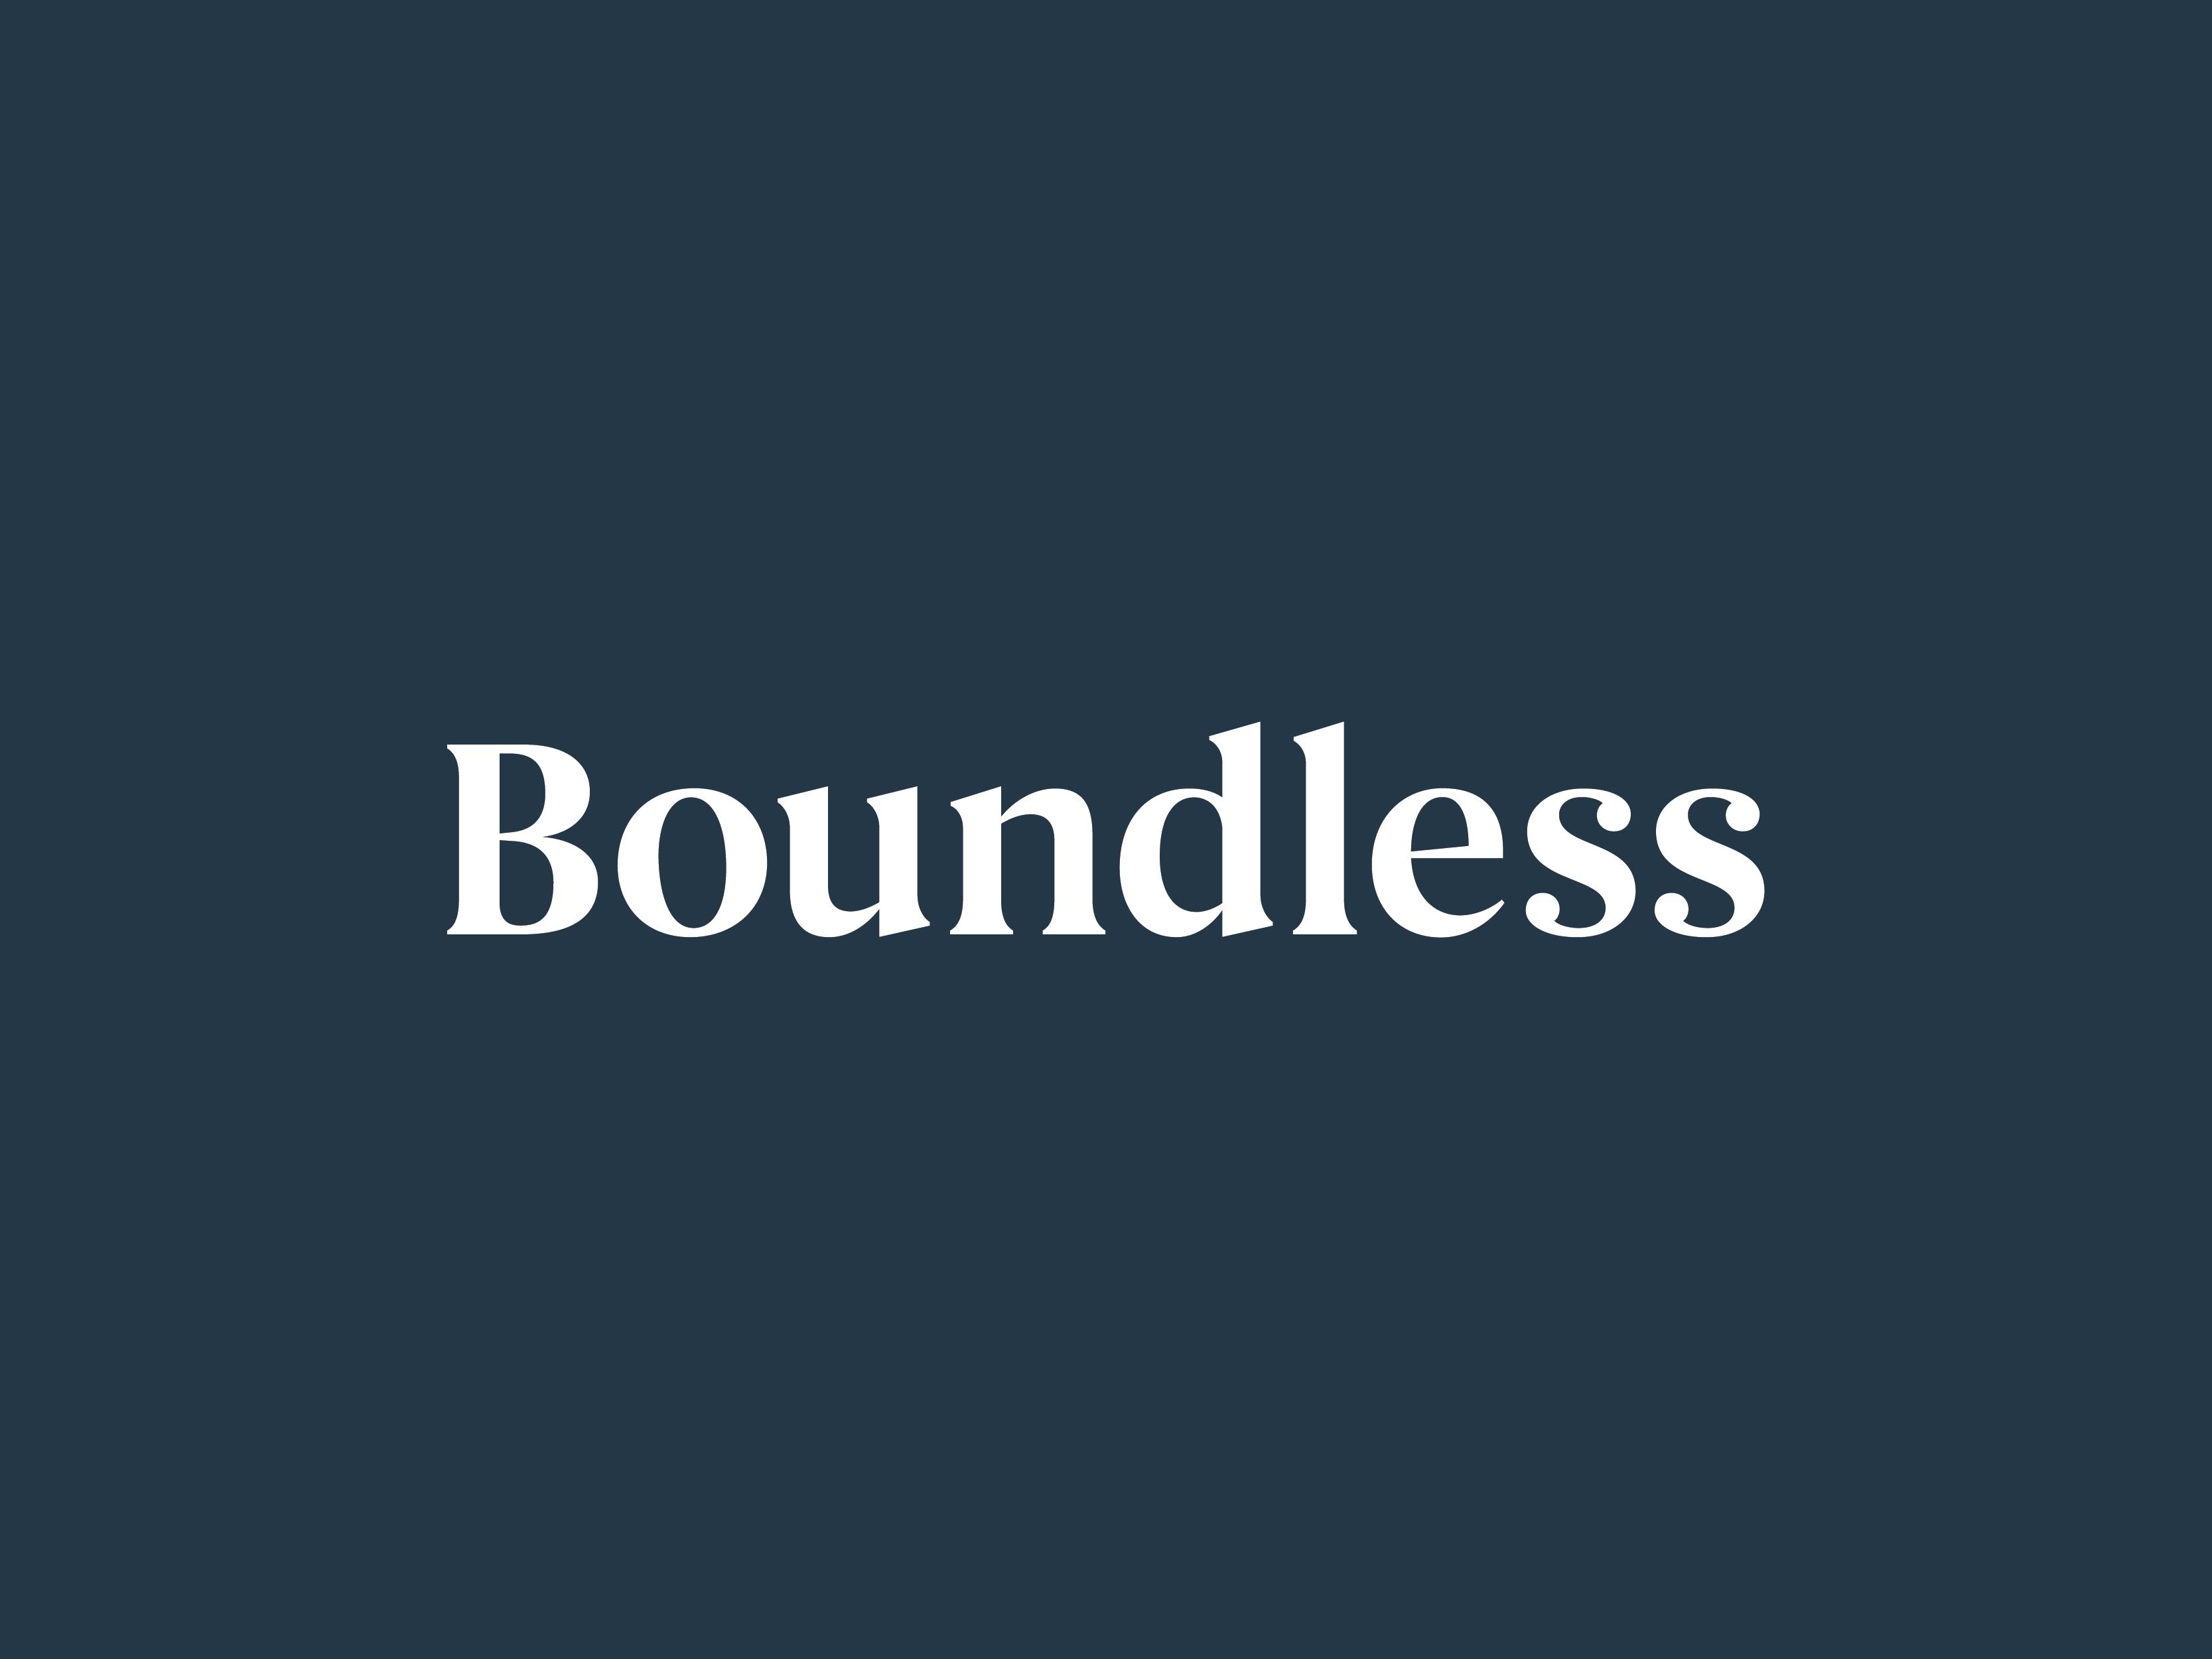 Boundless branding 01